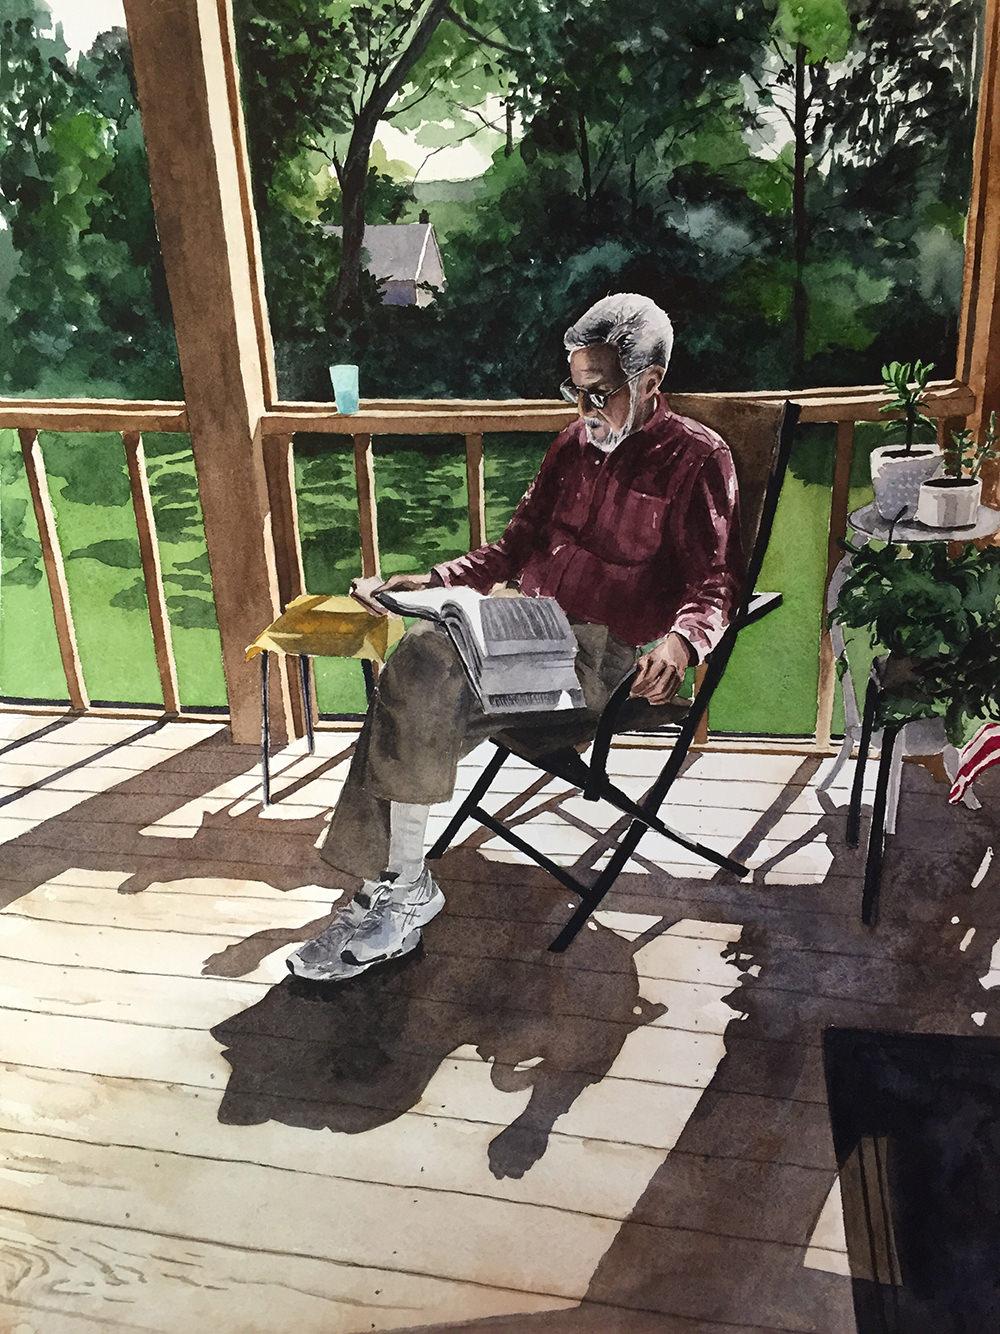 #WorldWatercolorGroup - Watercolor painting of man reading book by Ellie Moniz - #doodlewash